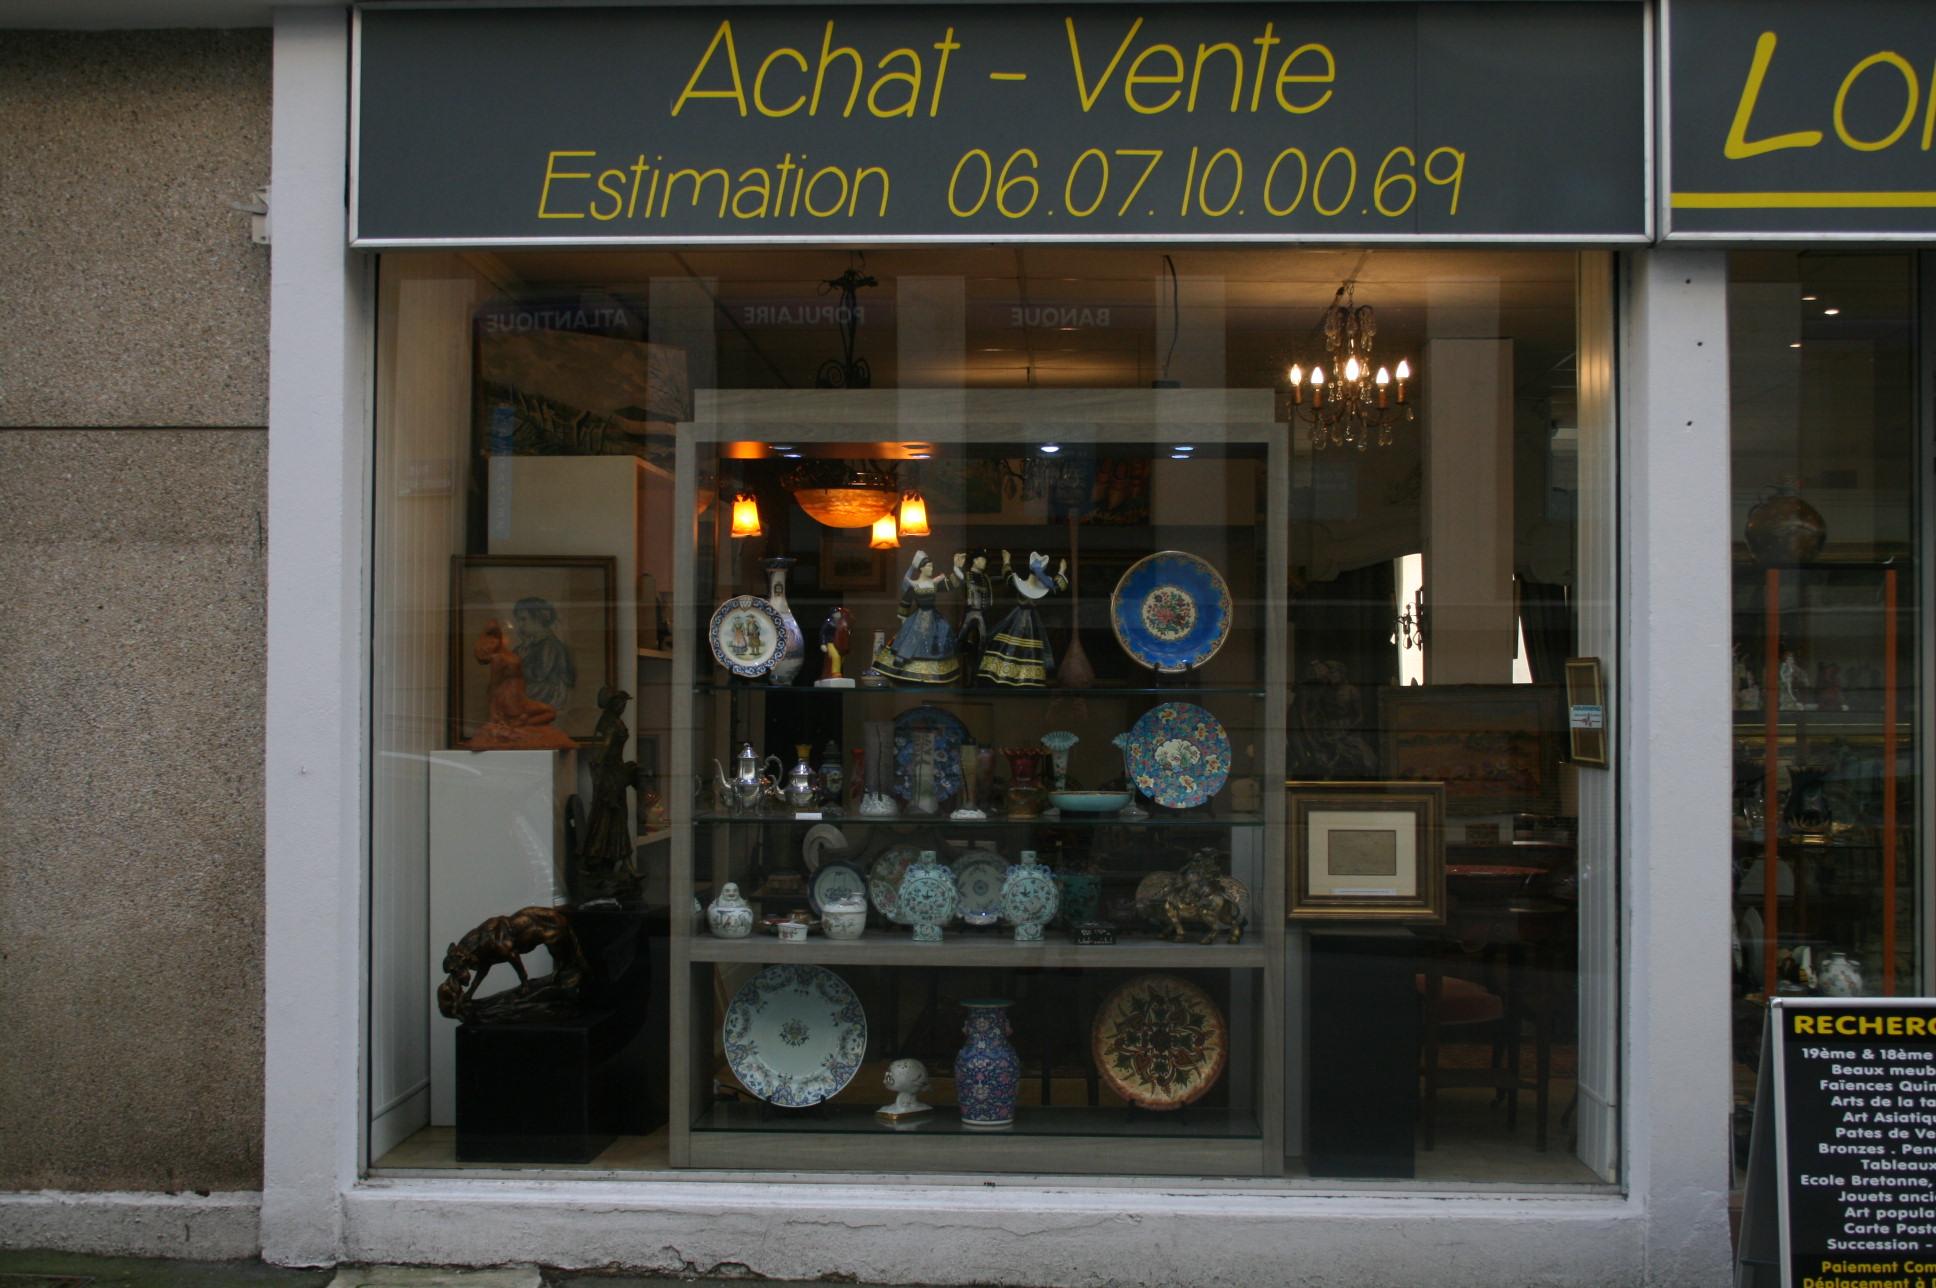 Commerce lorient ; Commerce Morbihan; Bretagne sud